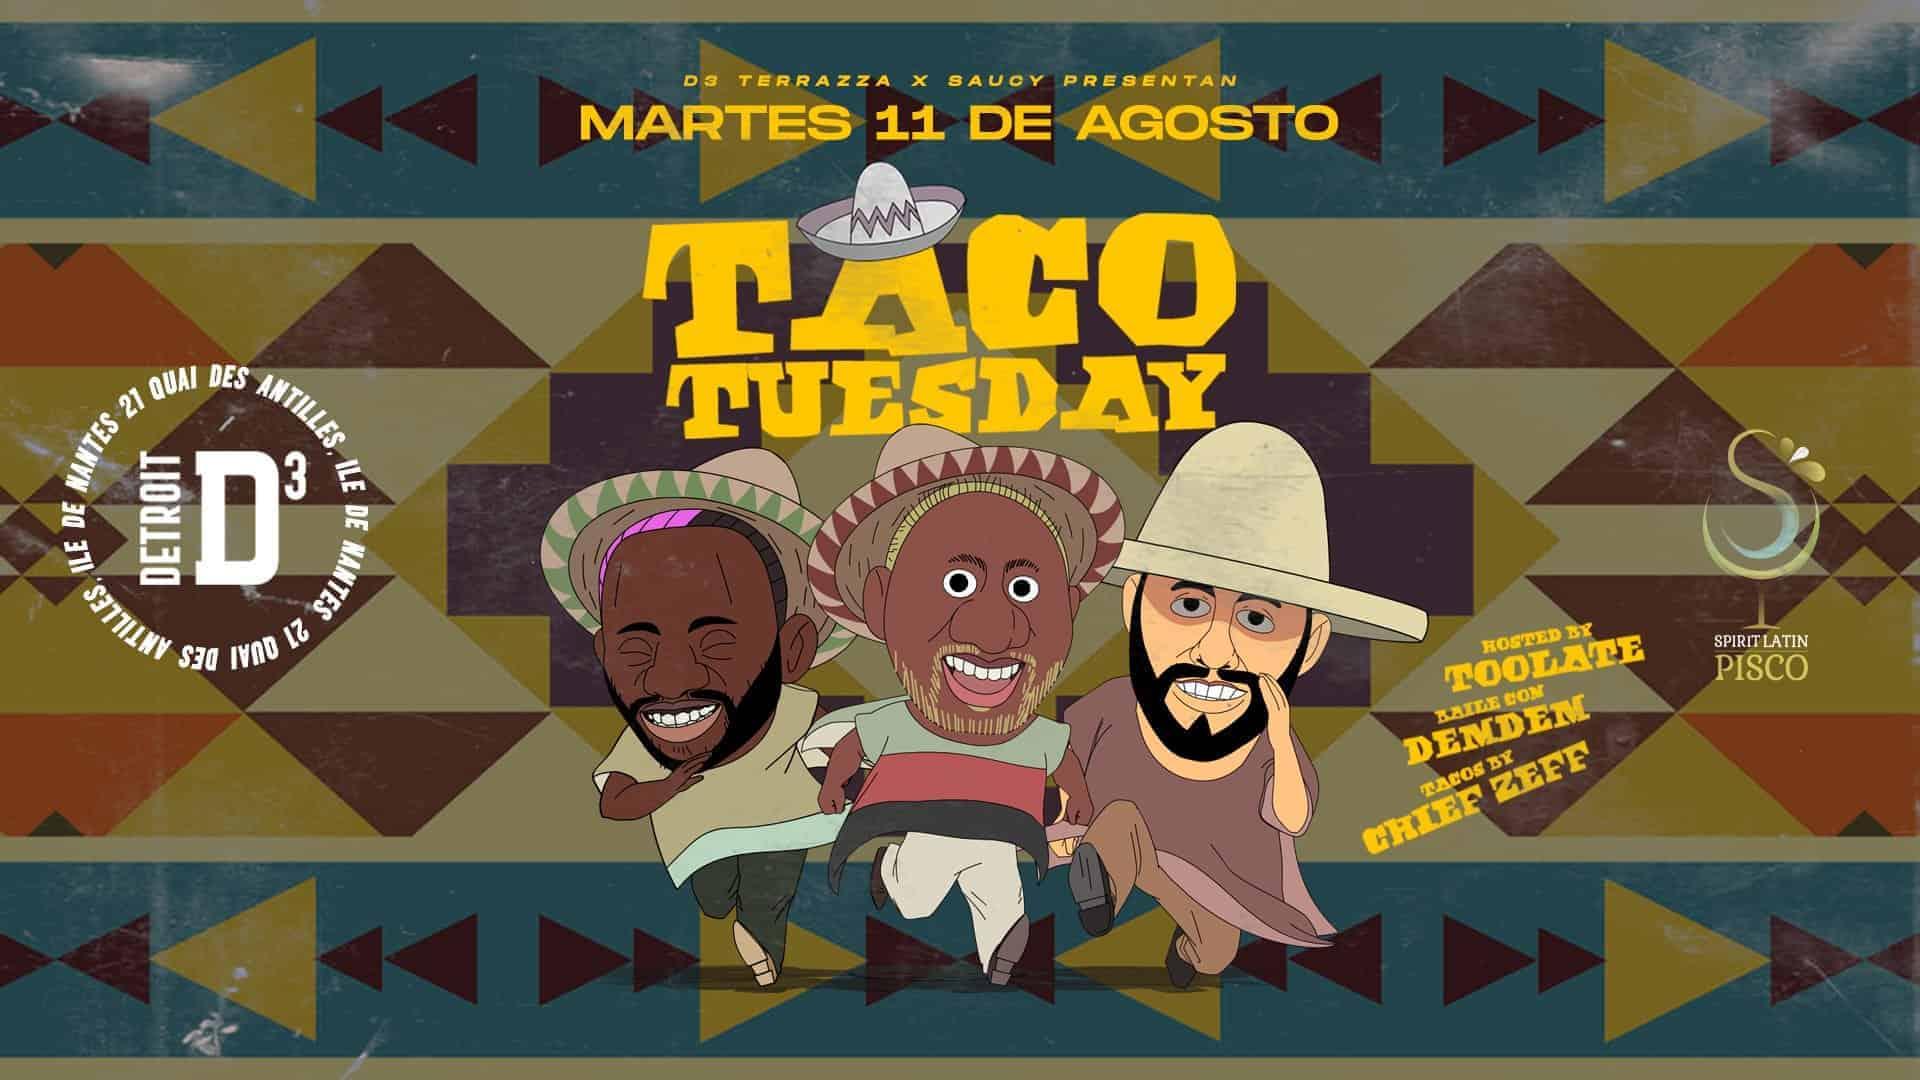 D3 tacos tuesday